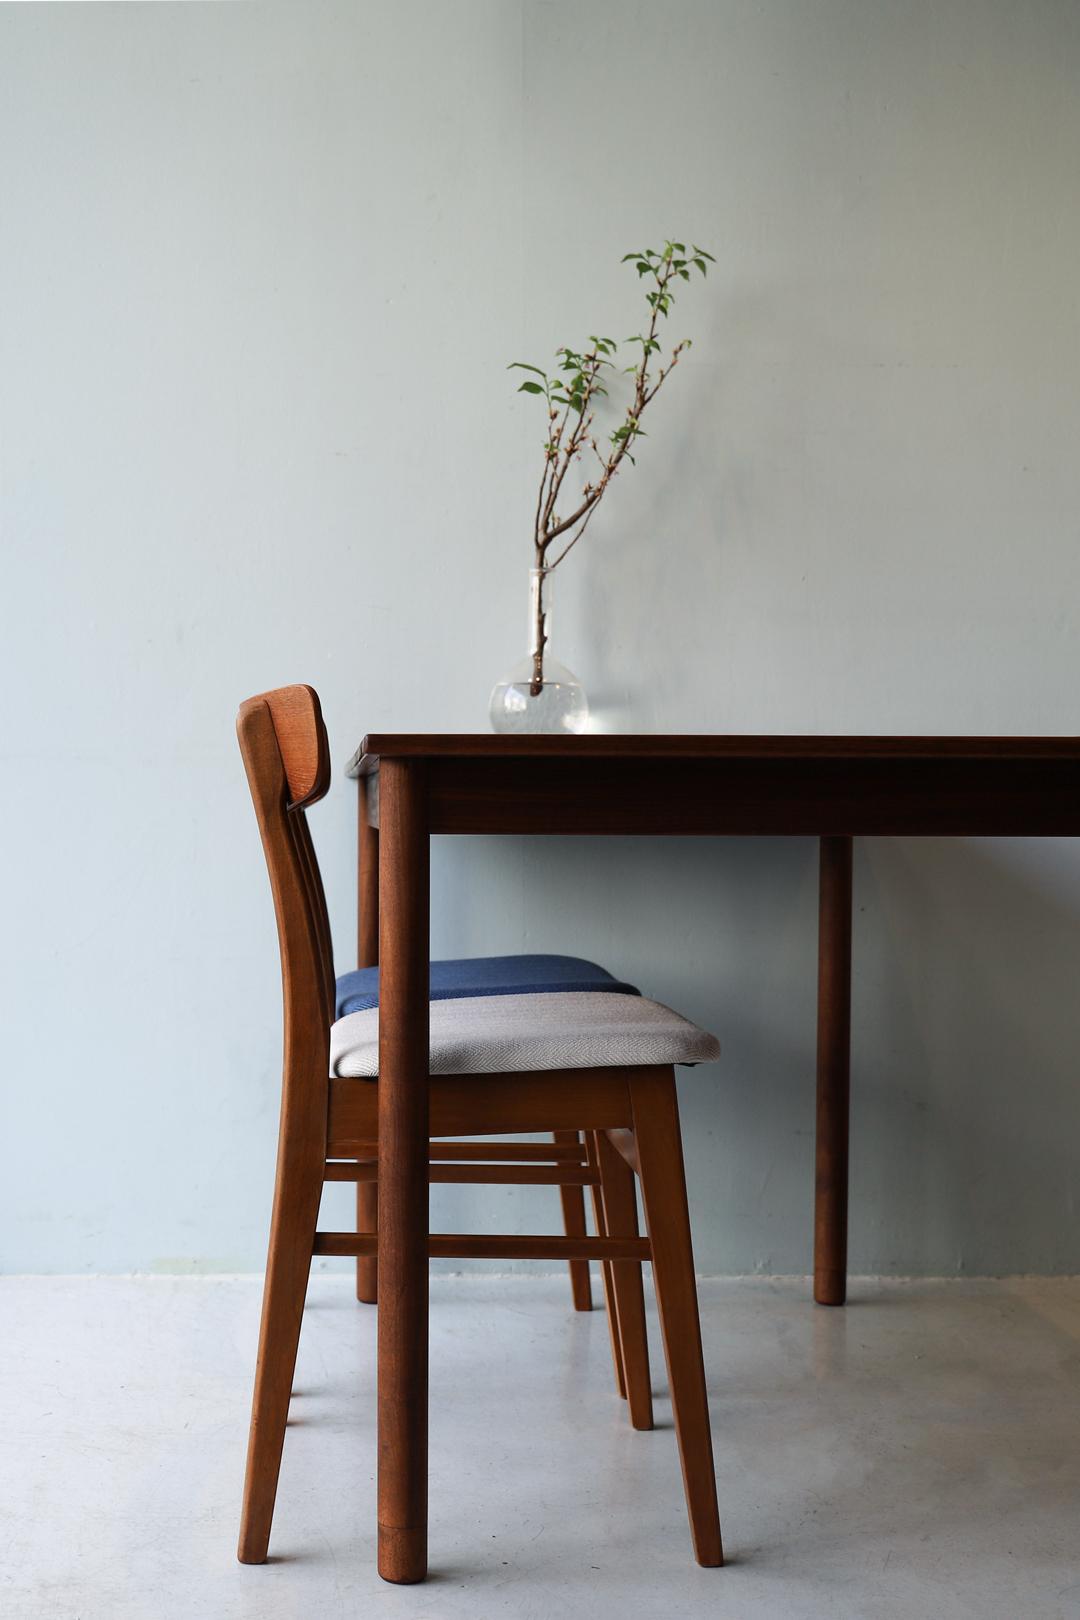 Danish Vintage Teakwood Living Dining Table/デンマーク ヴィンテージ リビング ダイニング テーブル チーク材 北欧家具